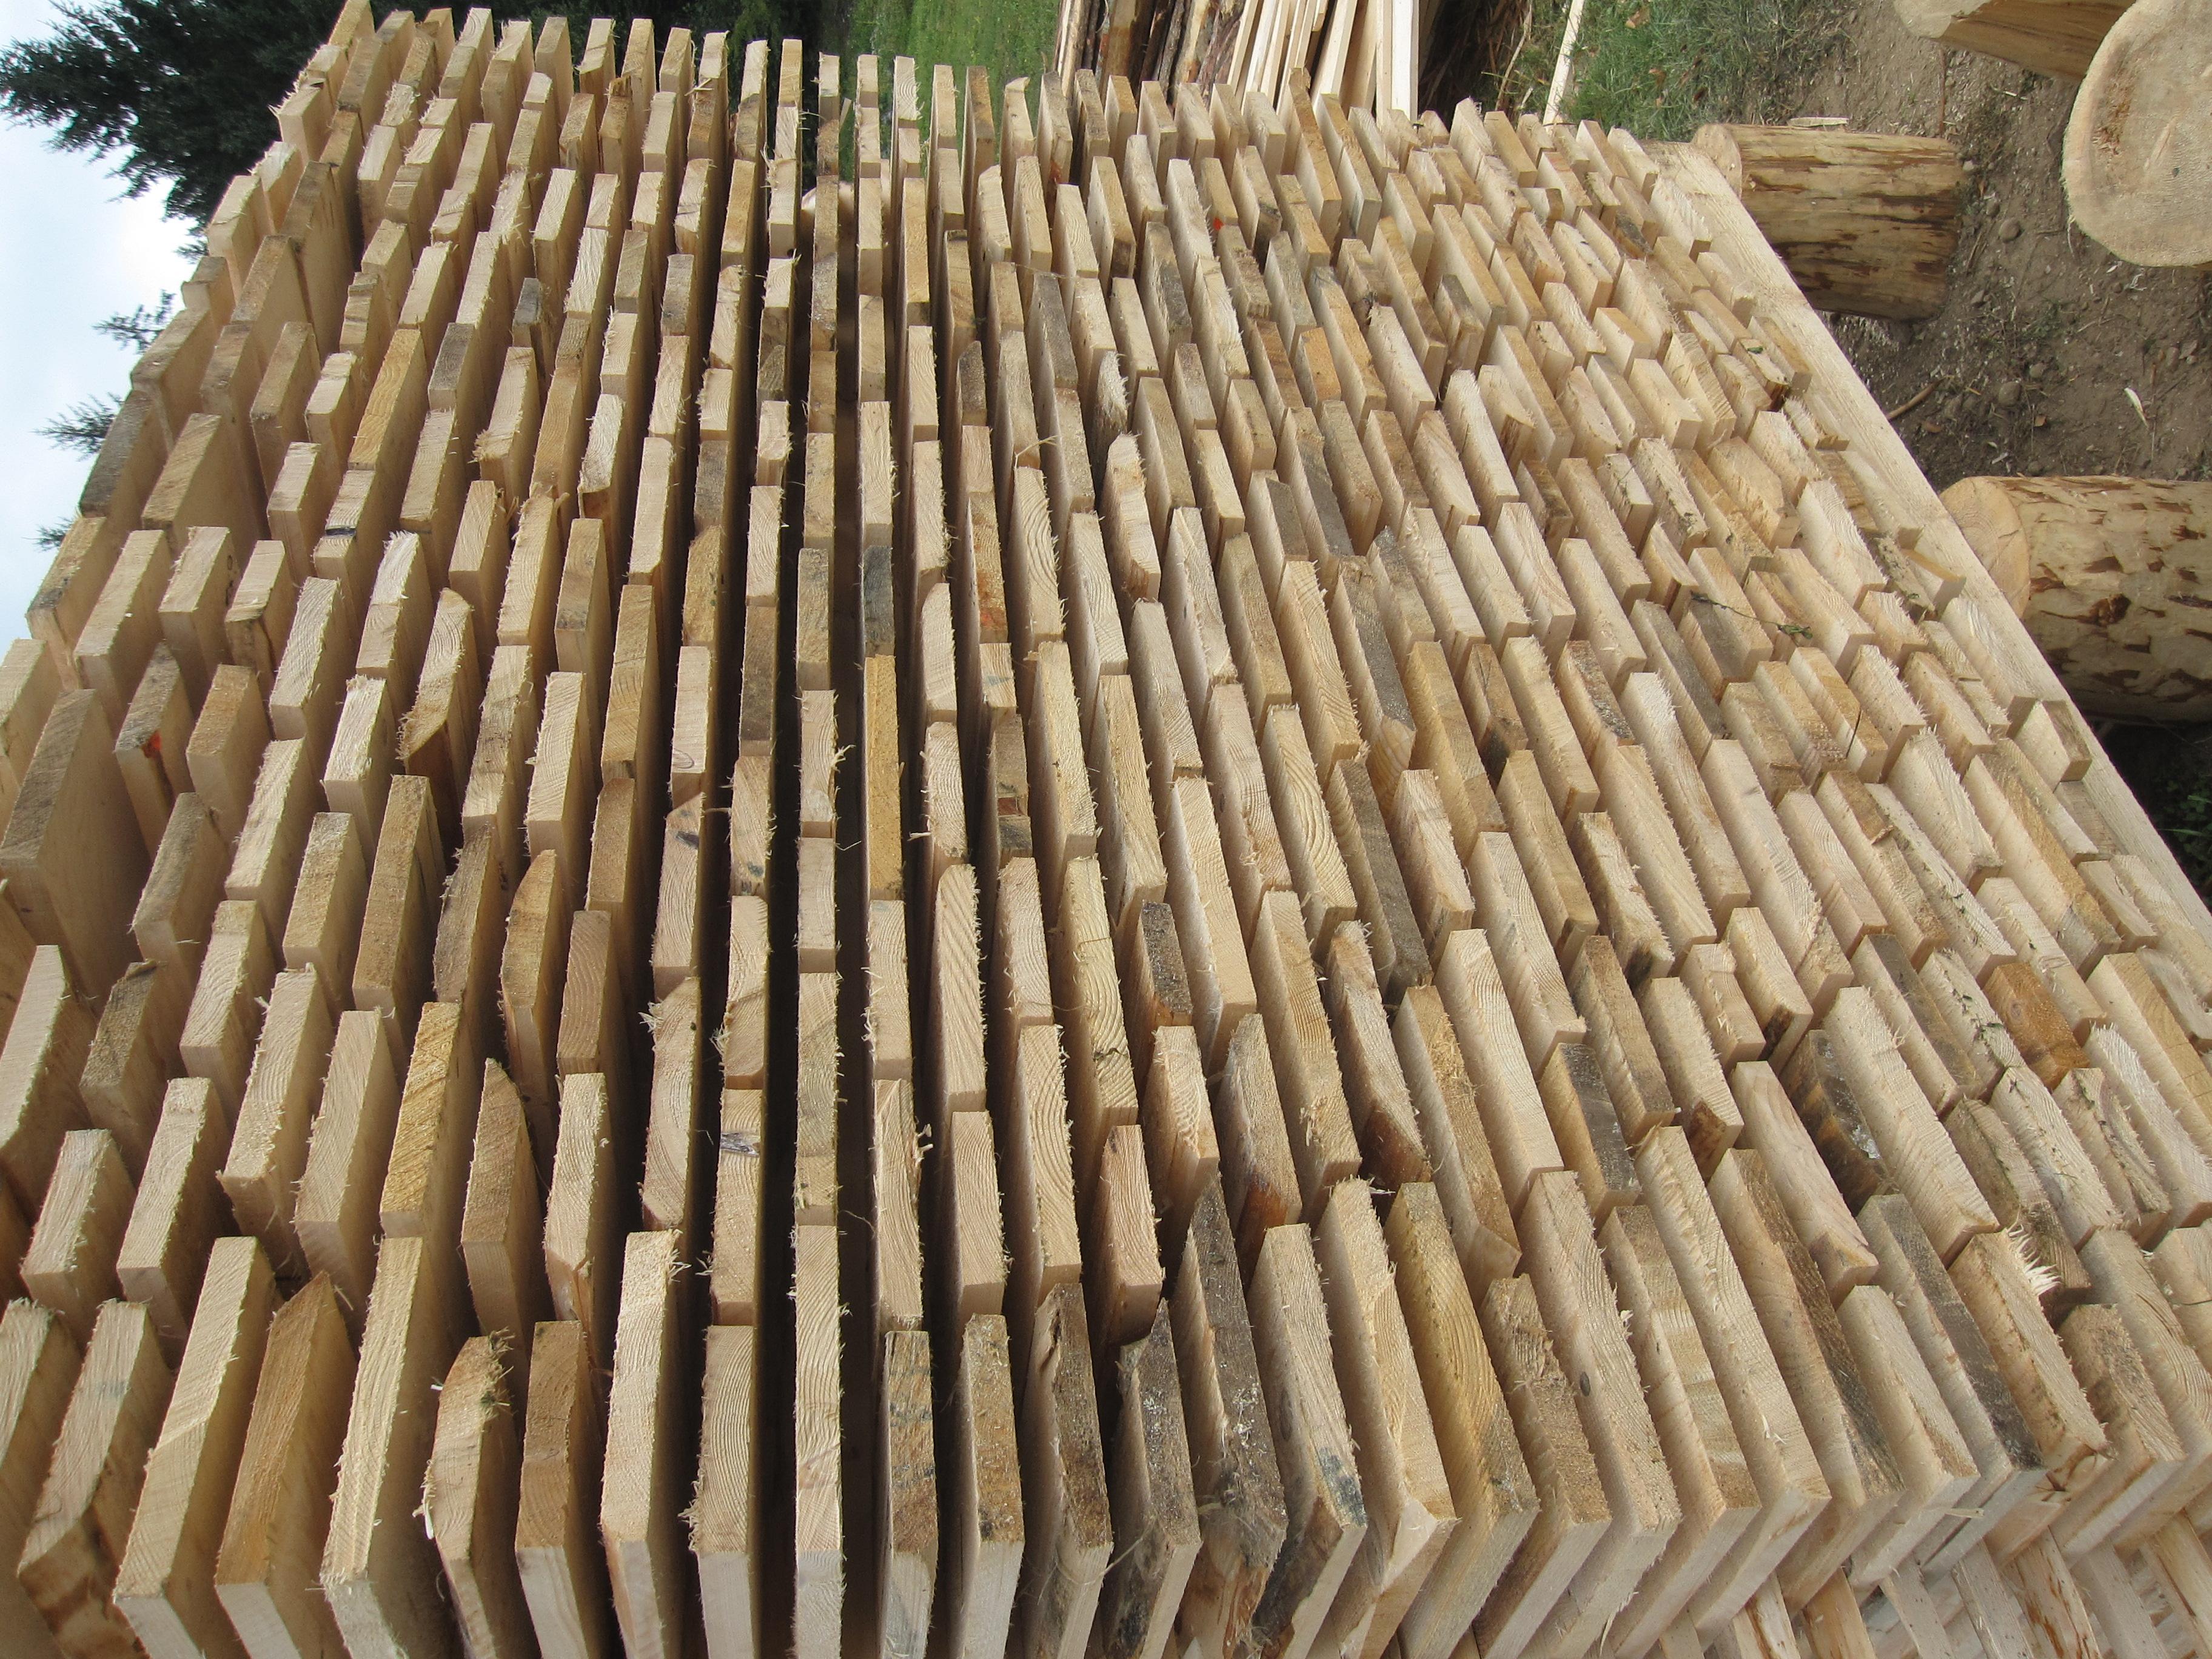 Wood drying - Wikipedia